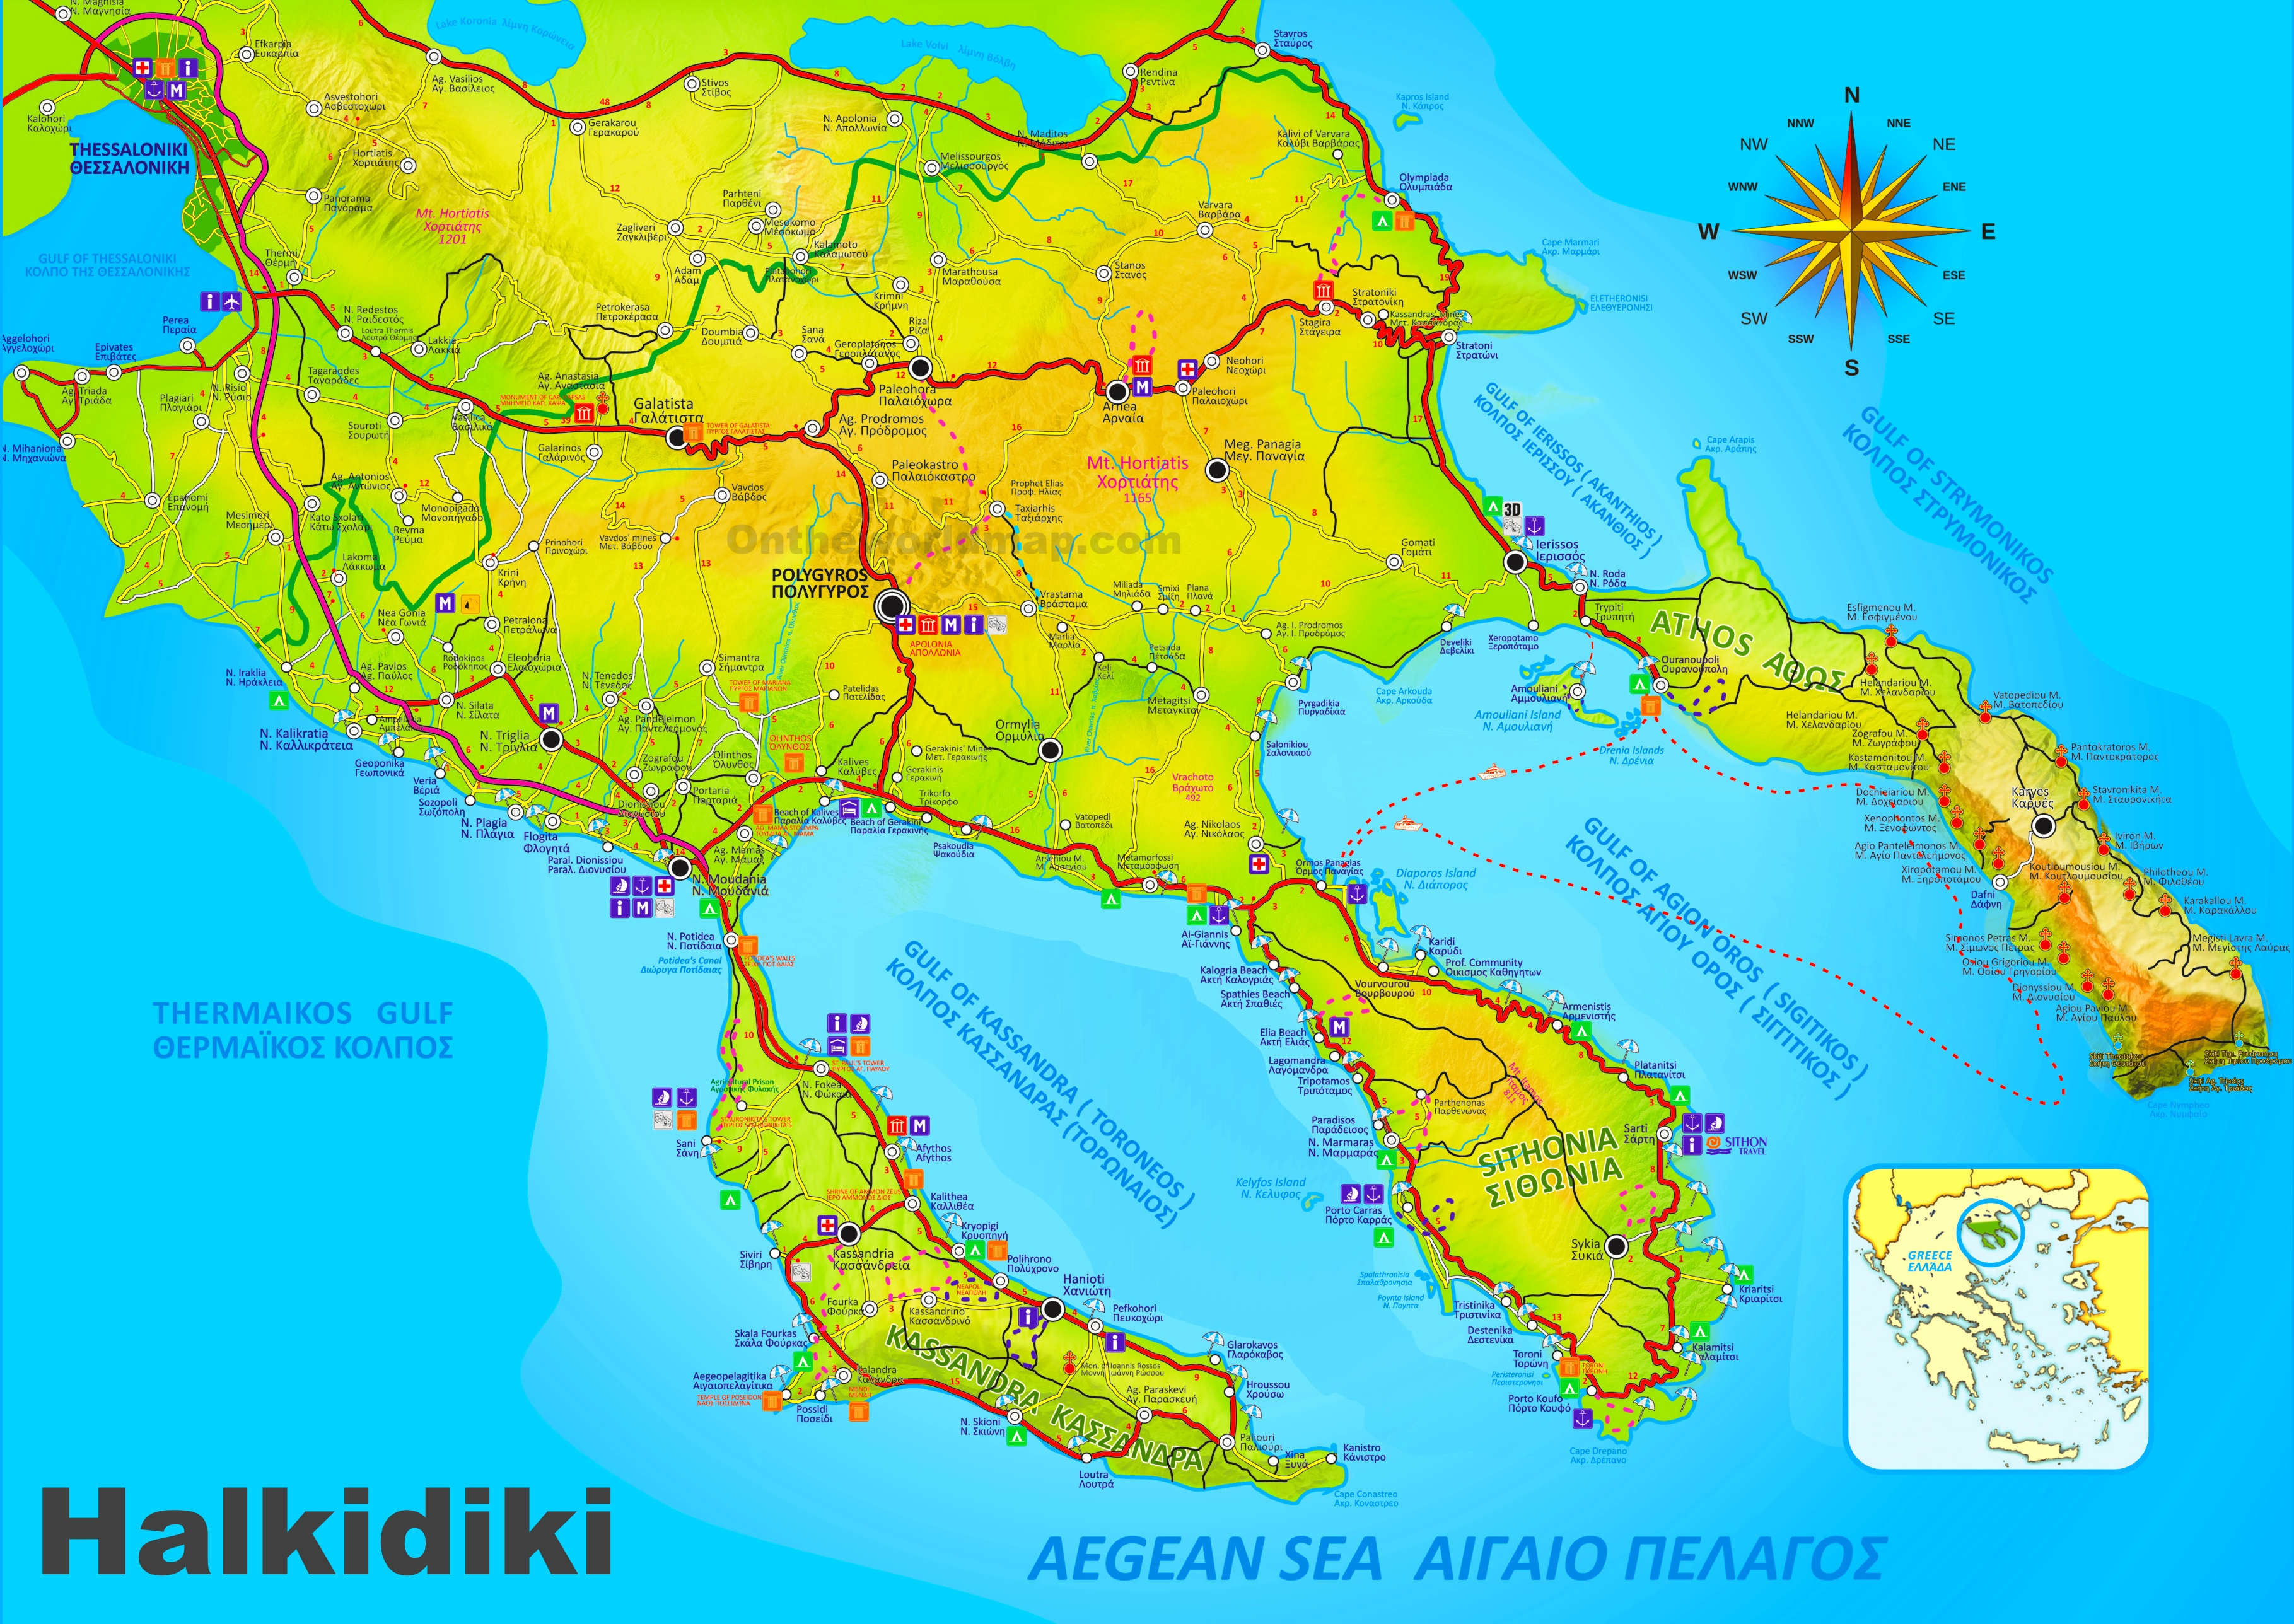 Halkidiki tourist map